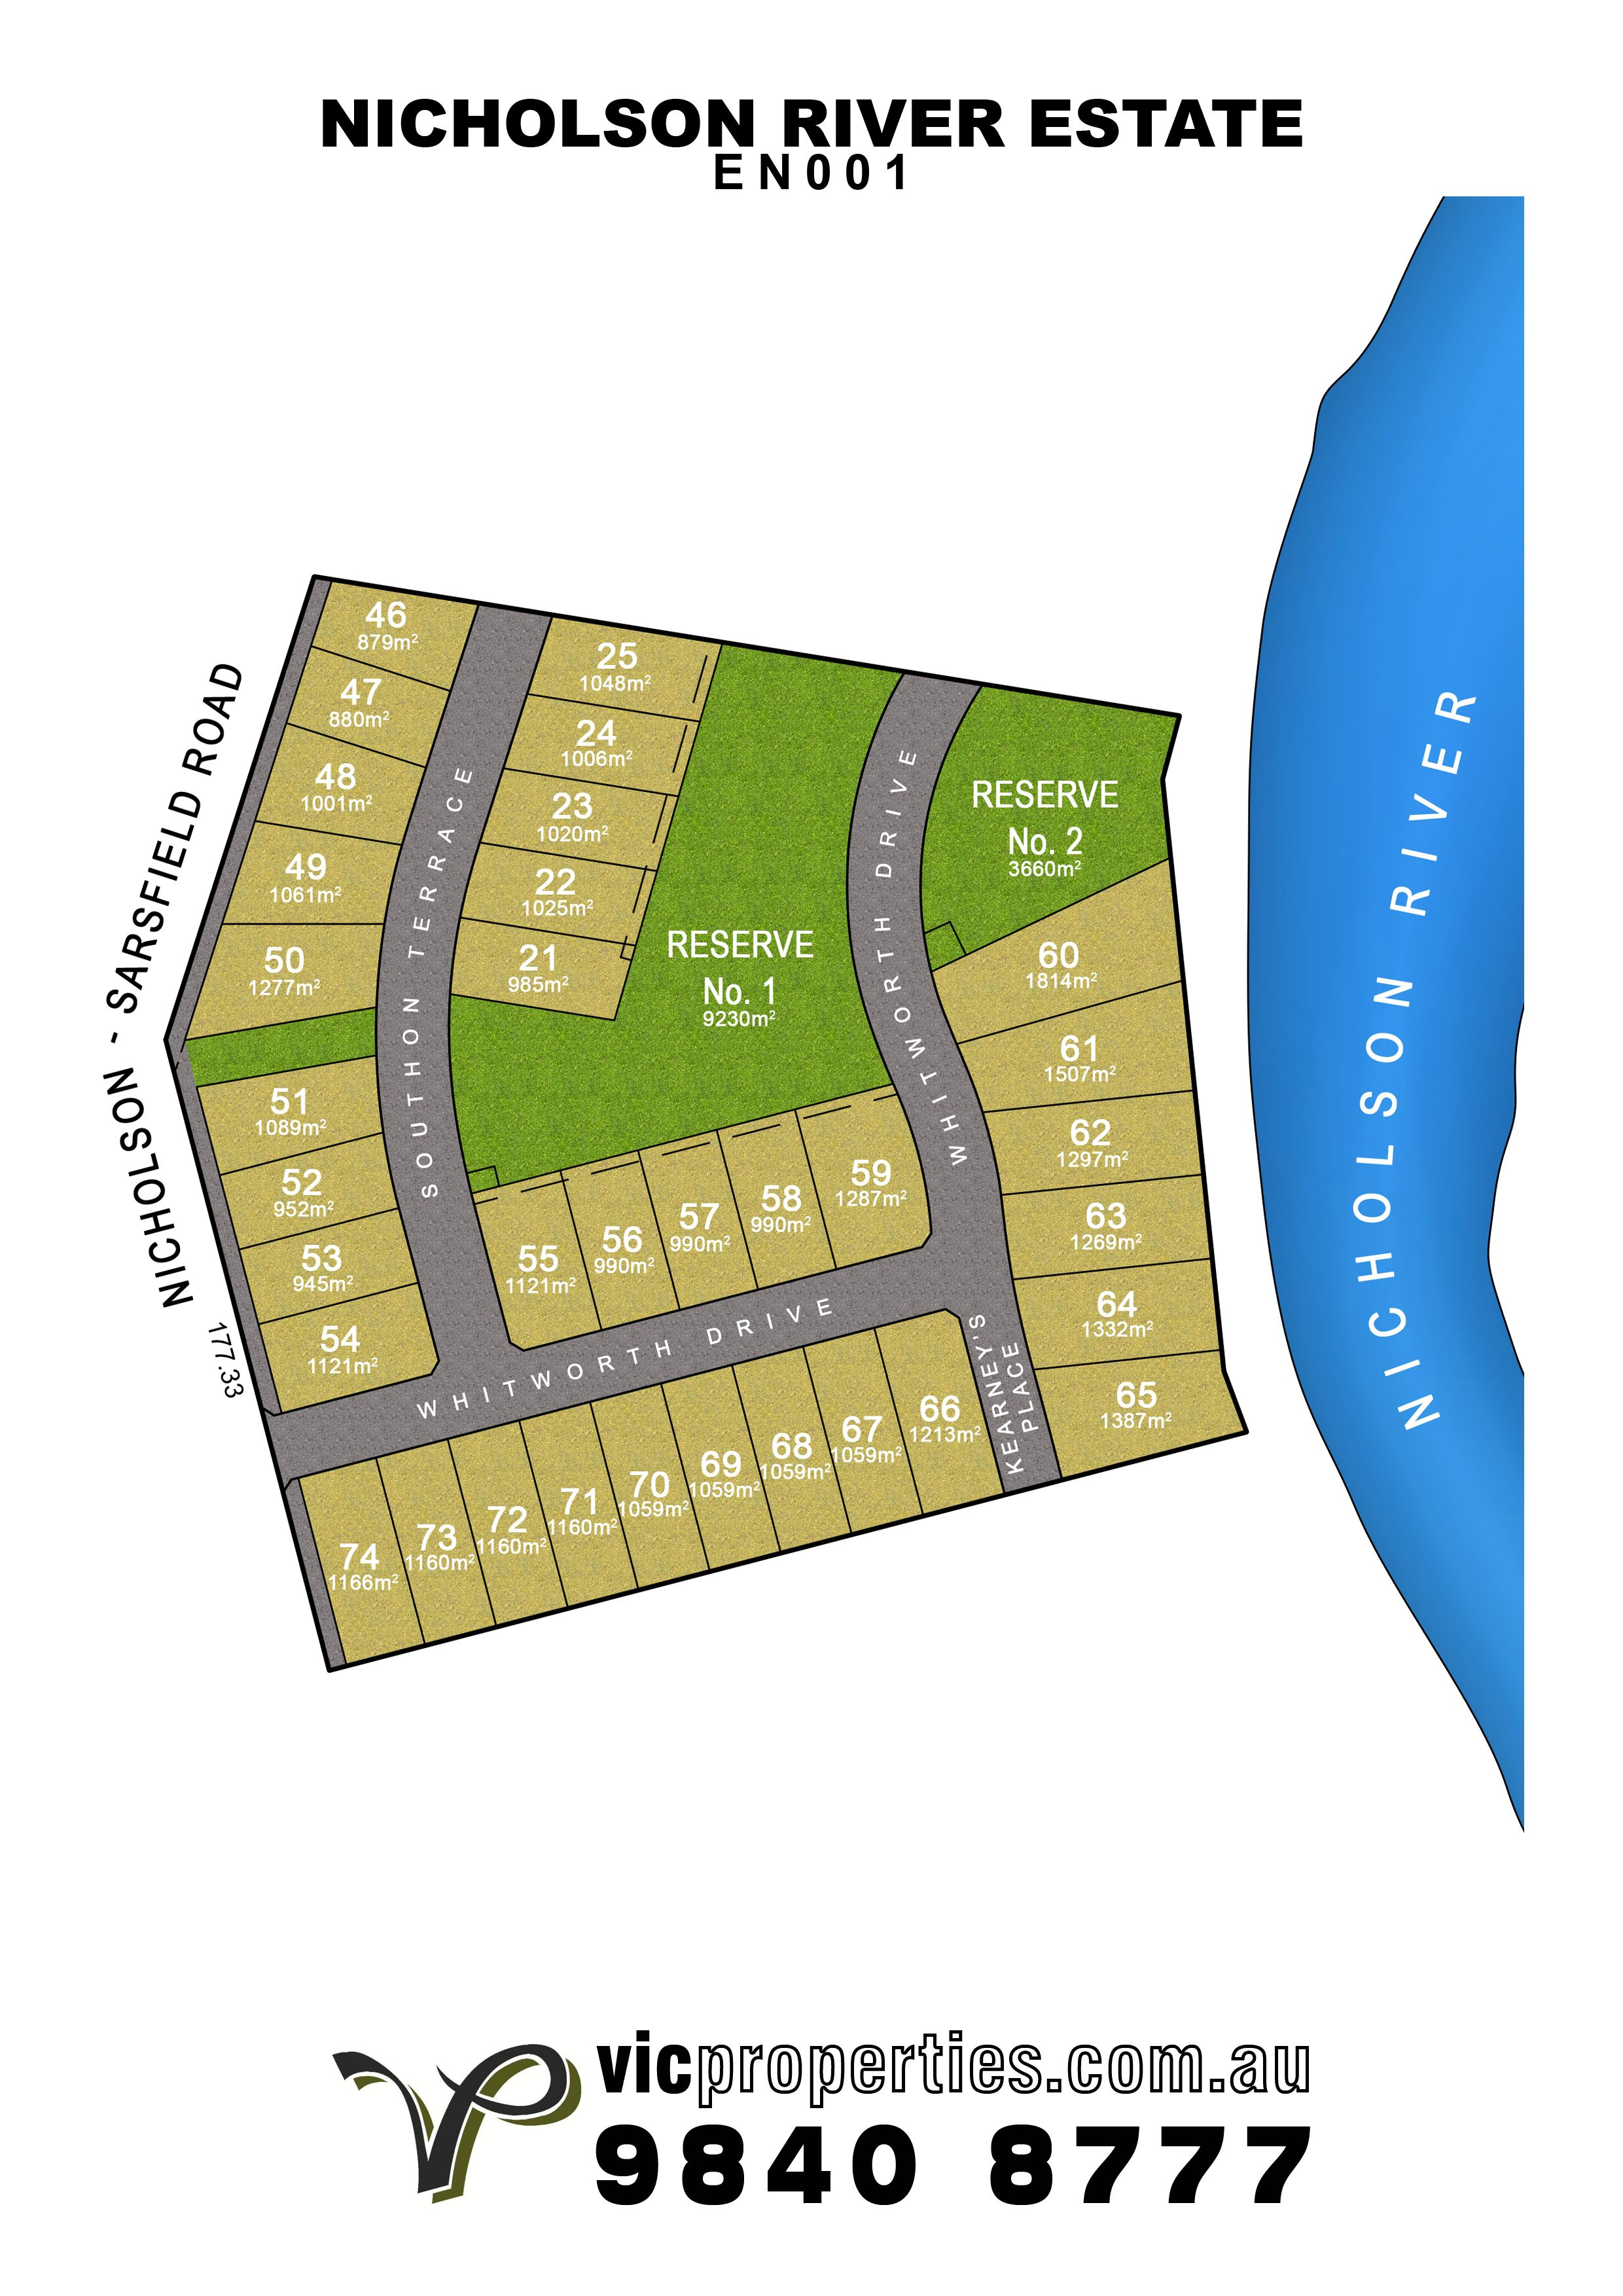 Lot 71/8 Whitworth Drive, Nicholson VIC 3882